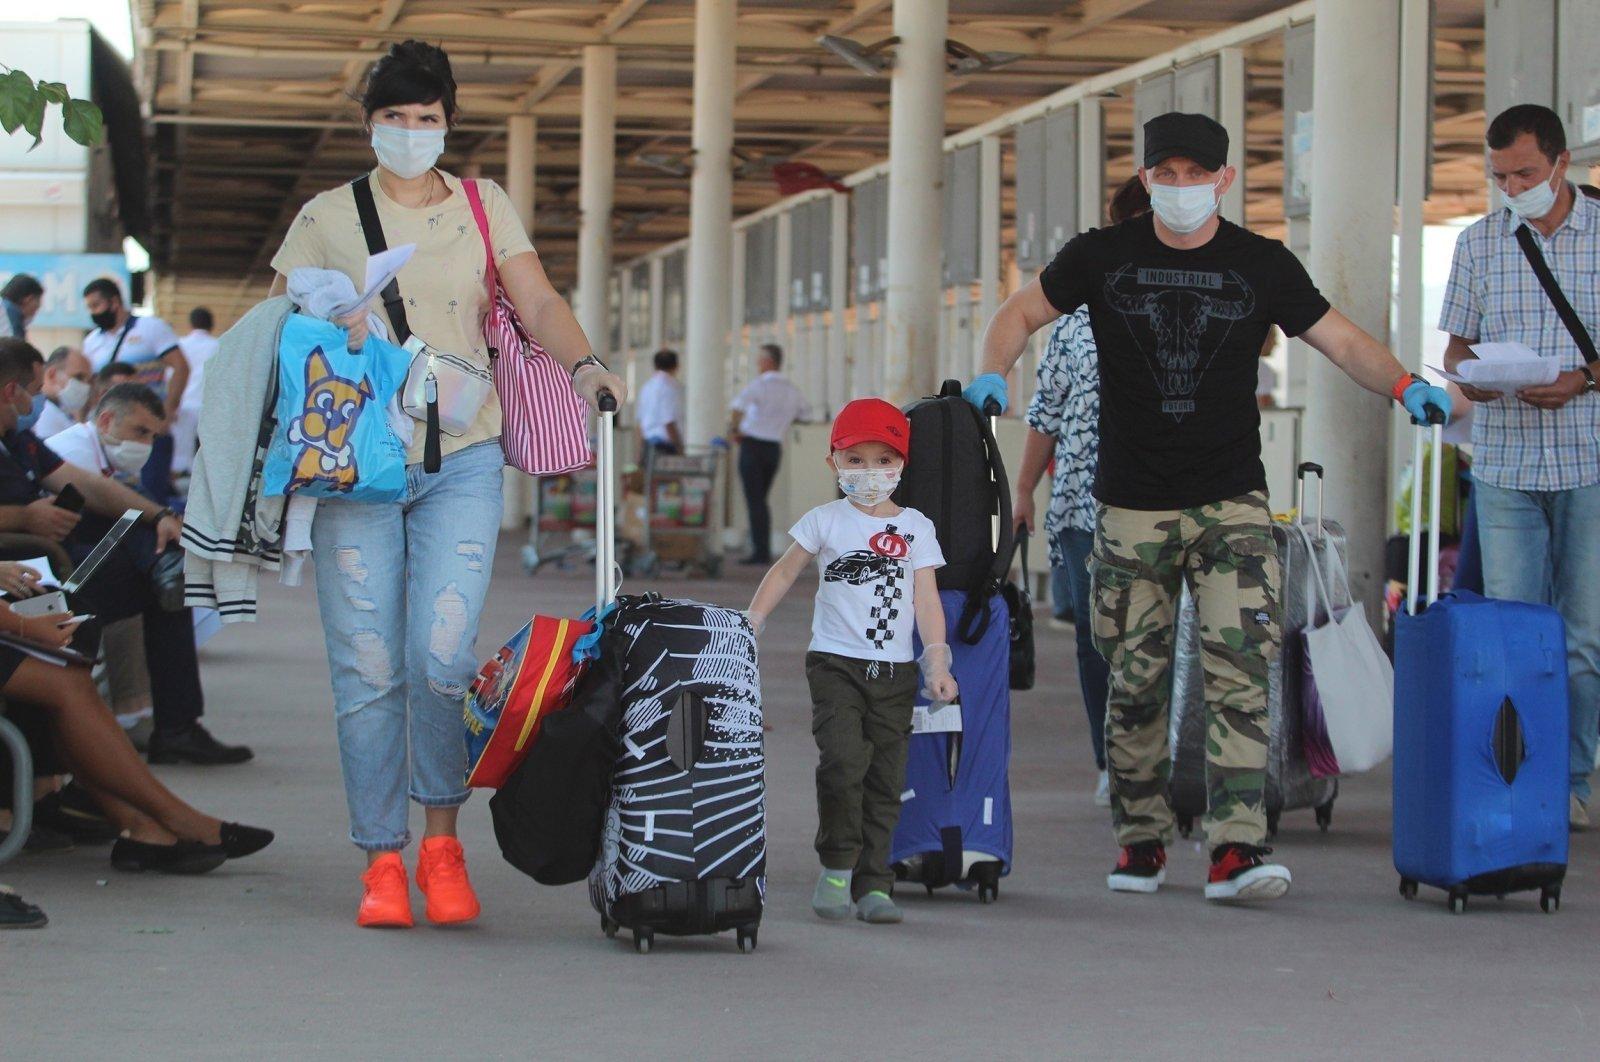 Ukrainian tourists arrive at Antalya airport, southern Turkey, April 19, 2021. (IHA Photo)